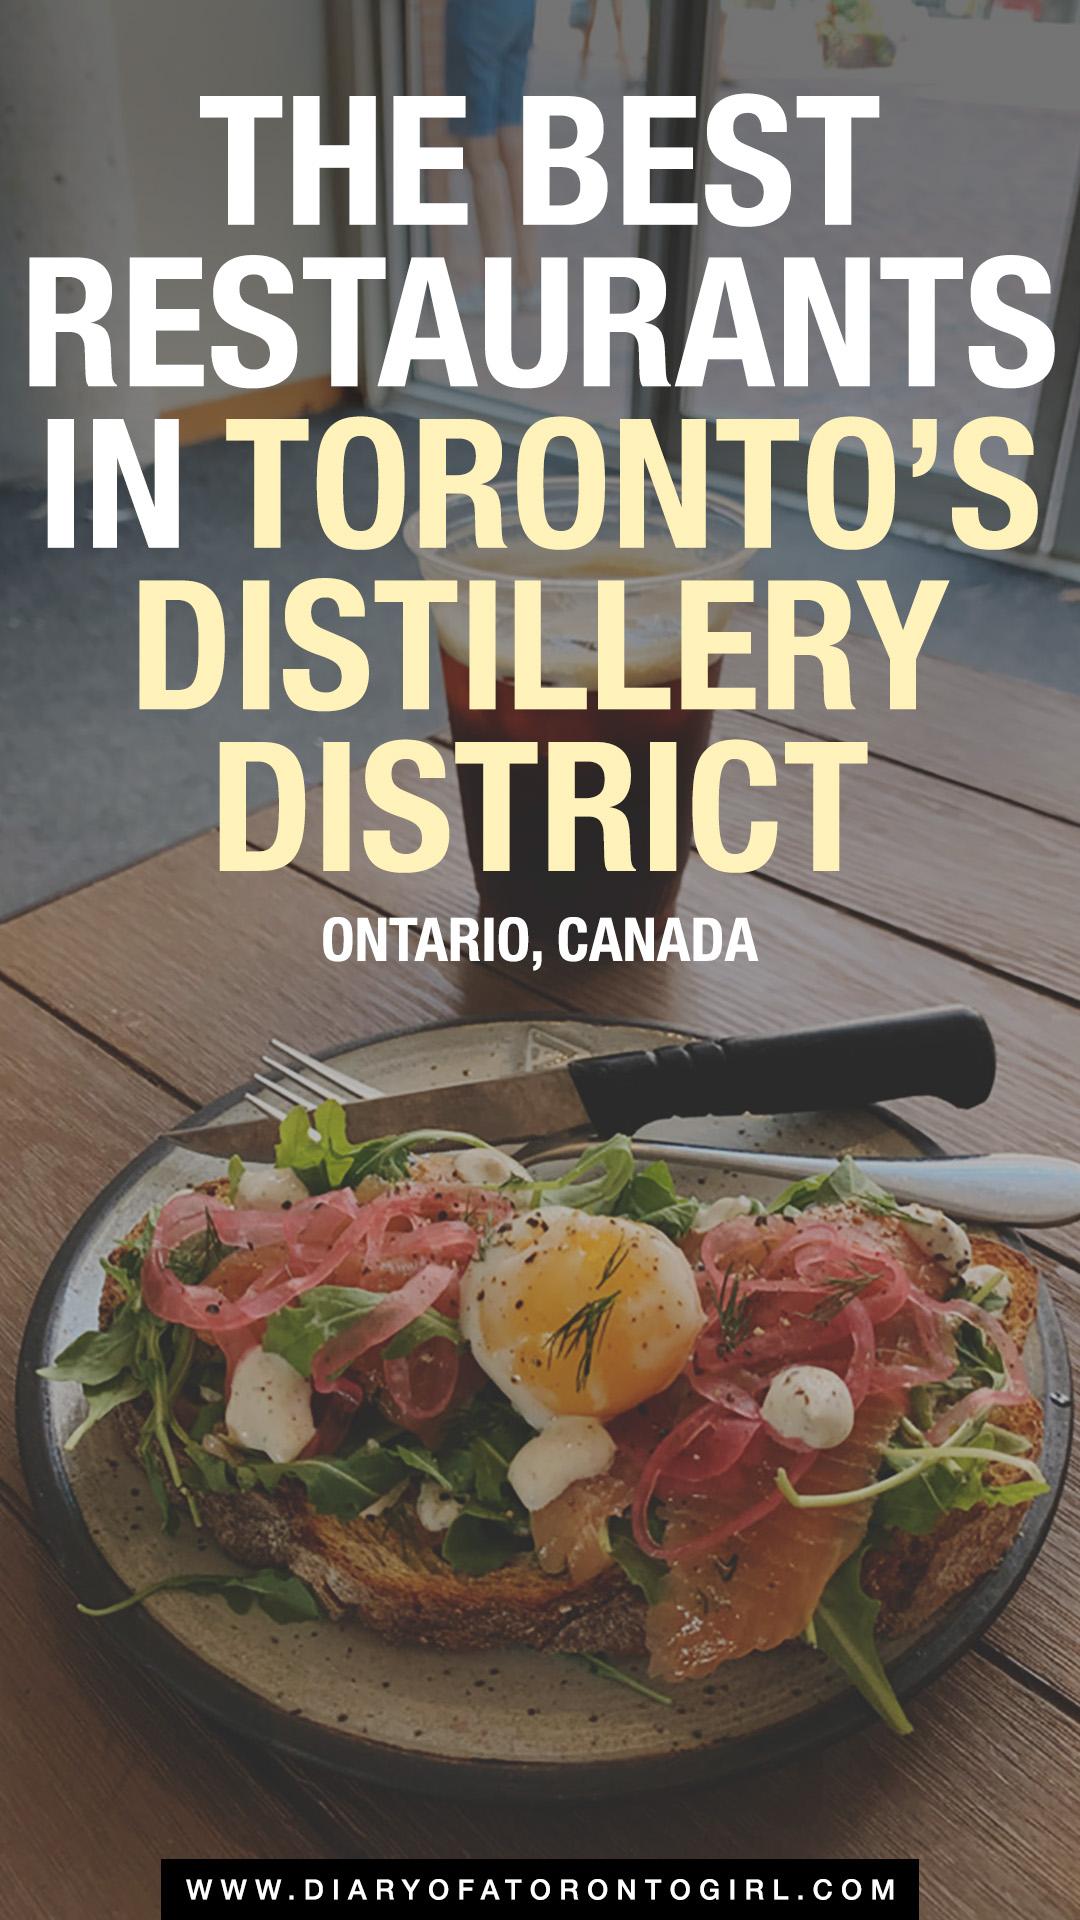 Toronto Distillery District restaurants